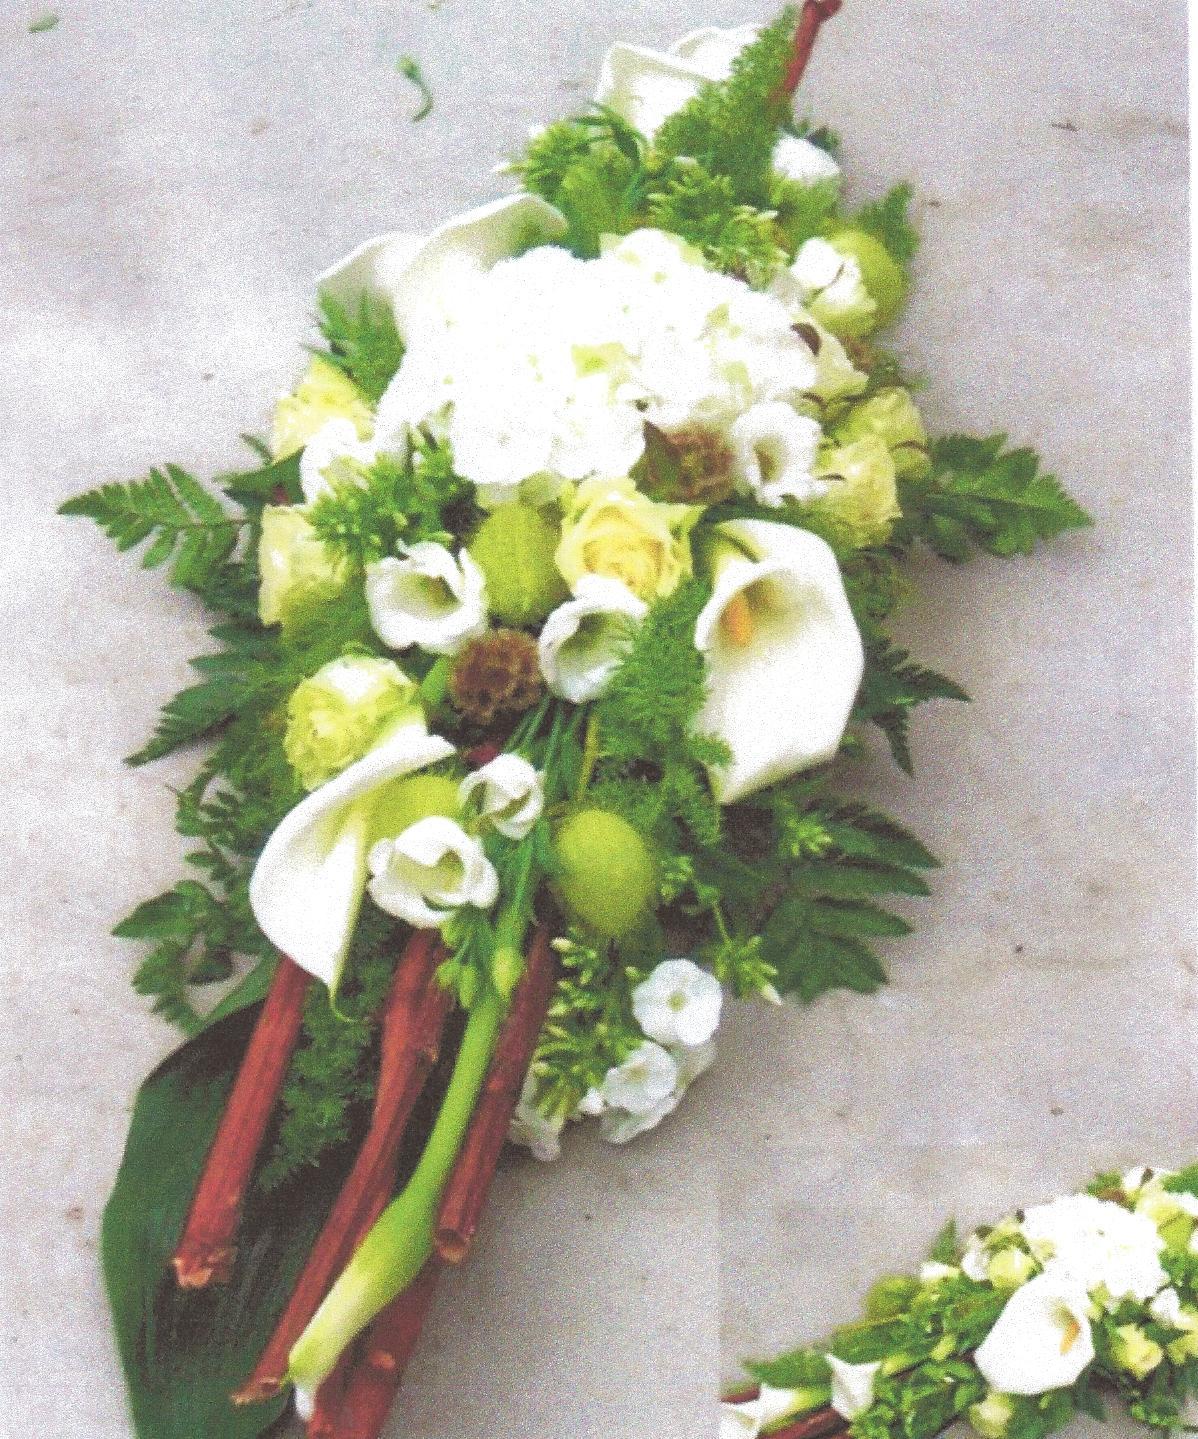 NR 08 Bloemstuk calla rozen bamboo polygorum en seizoensvulling 90 euro